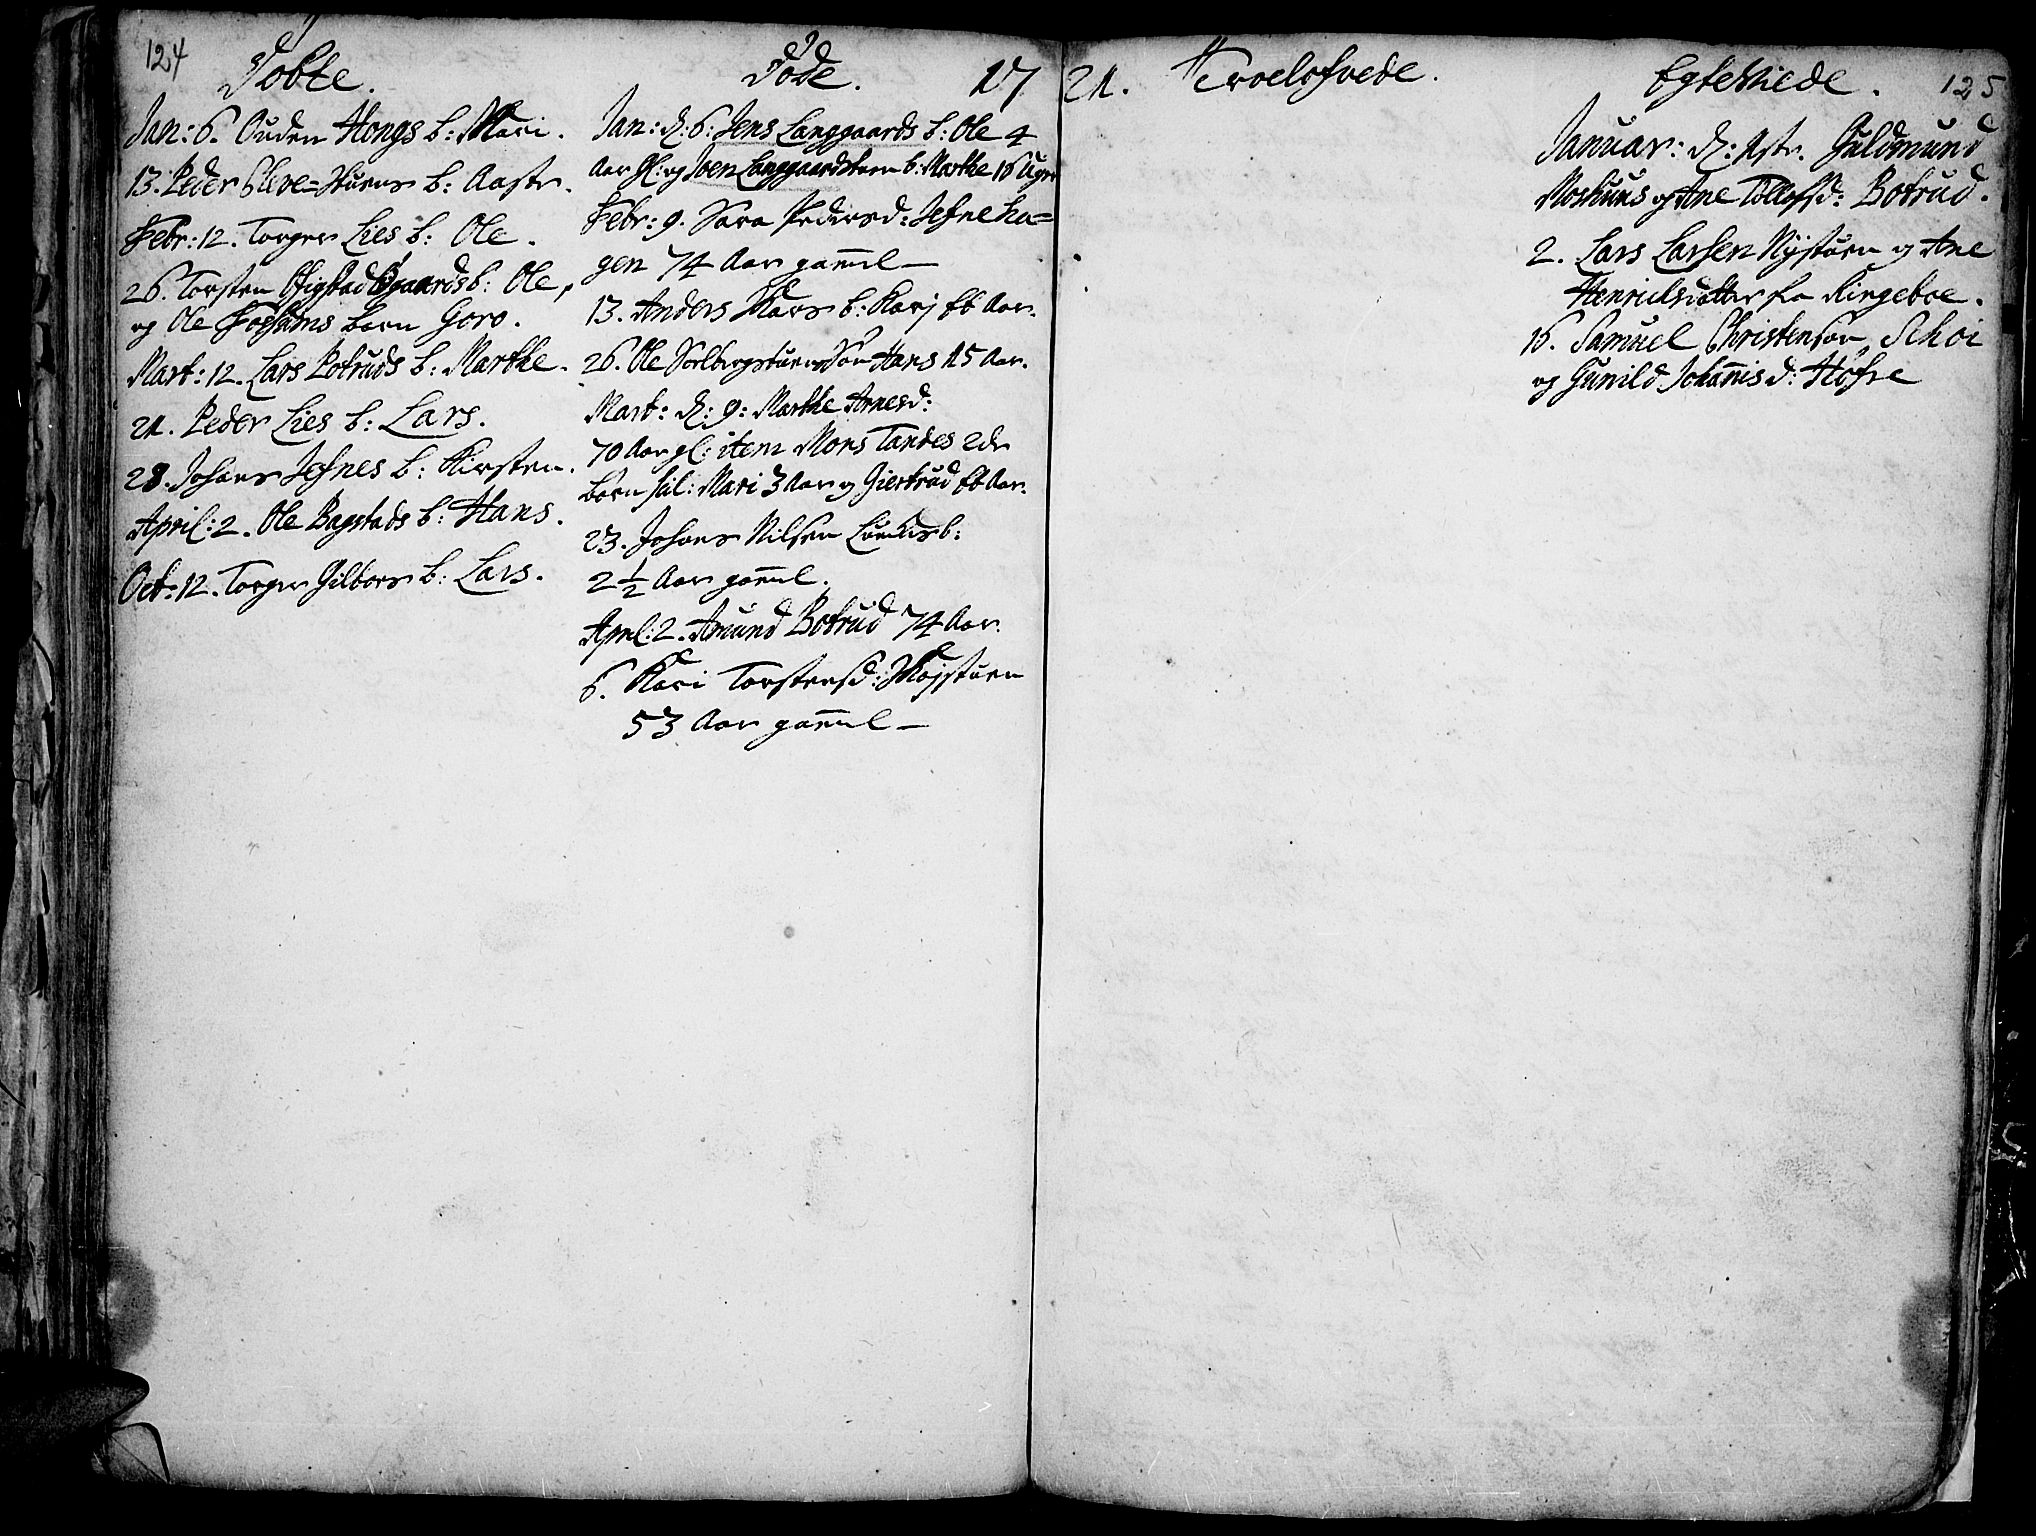 SAH, Øyer prestekontor, Ministerialbok nr. 1, 1671-1727, s. 124-125